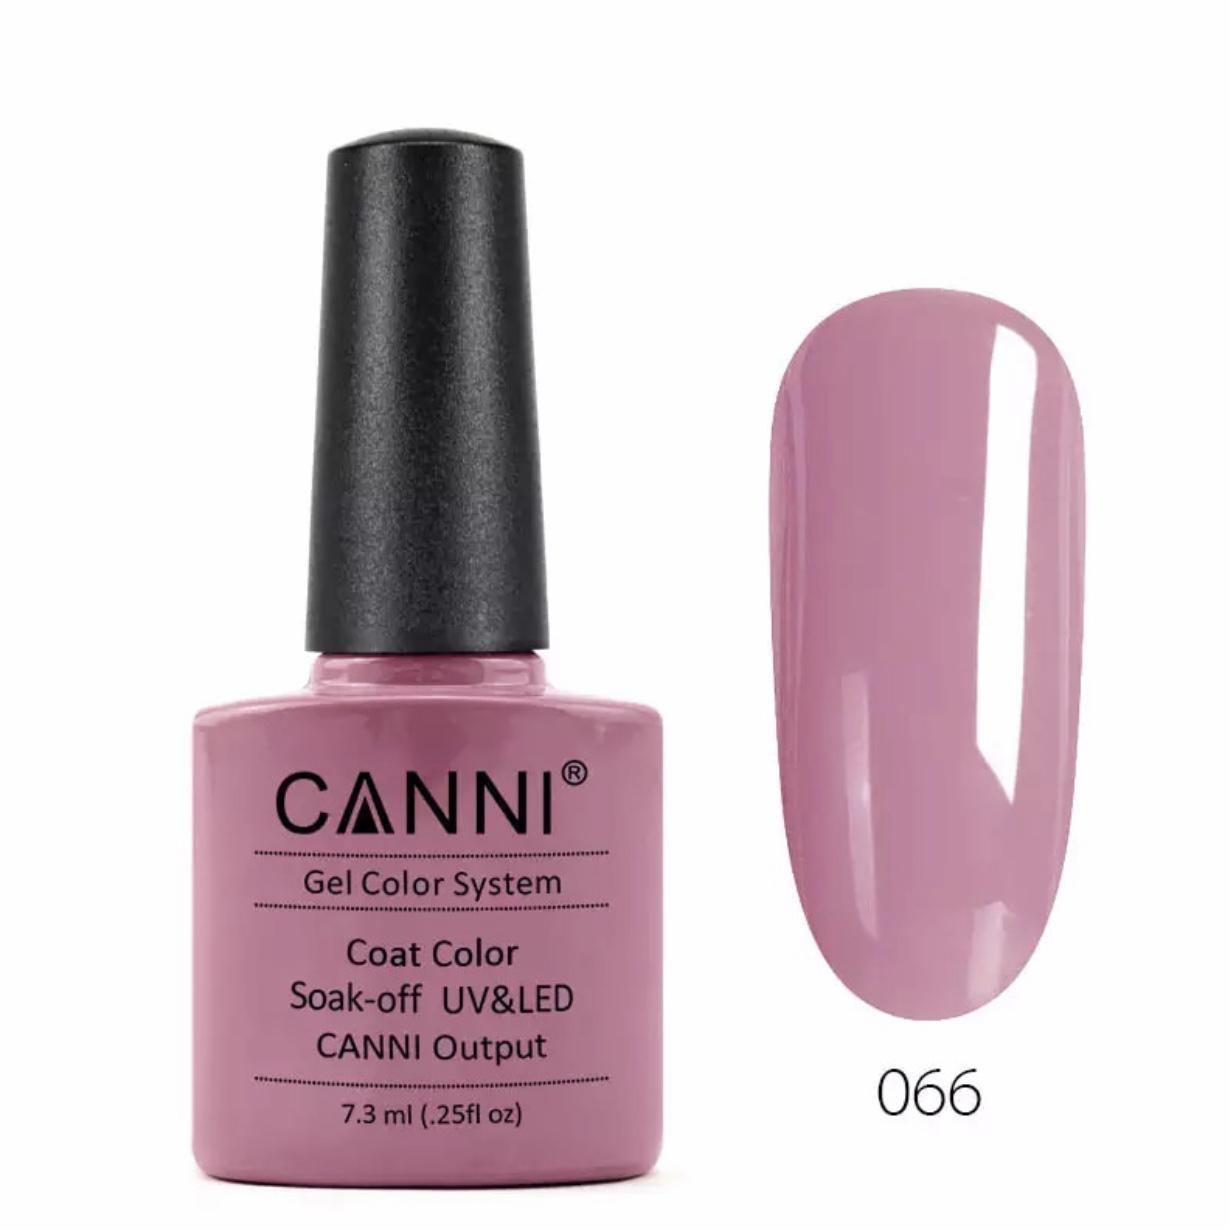 CANNI Gel Nail Color Coat 7.3ml (001-066) cao cấp